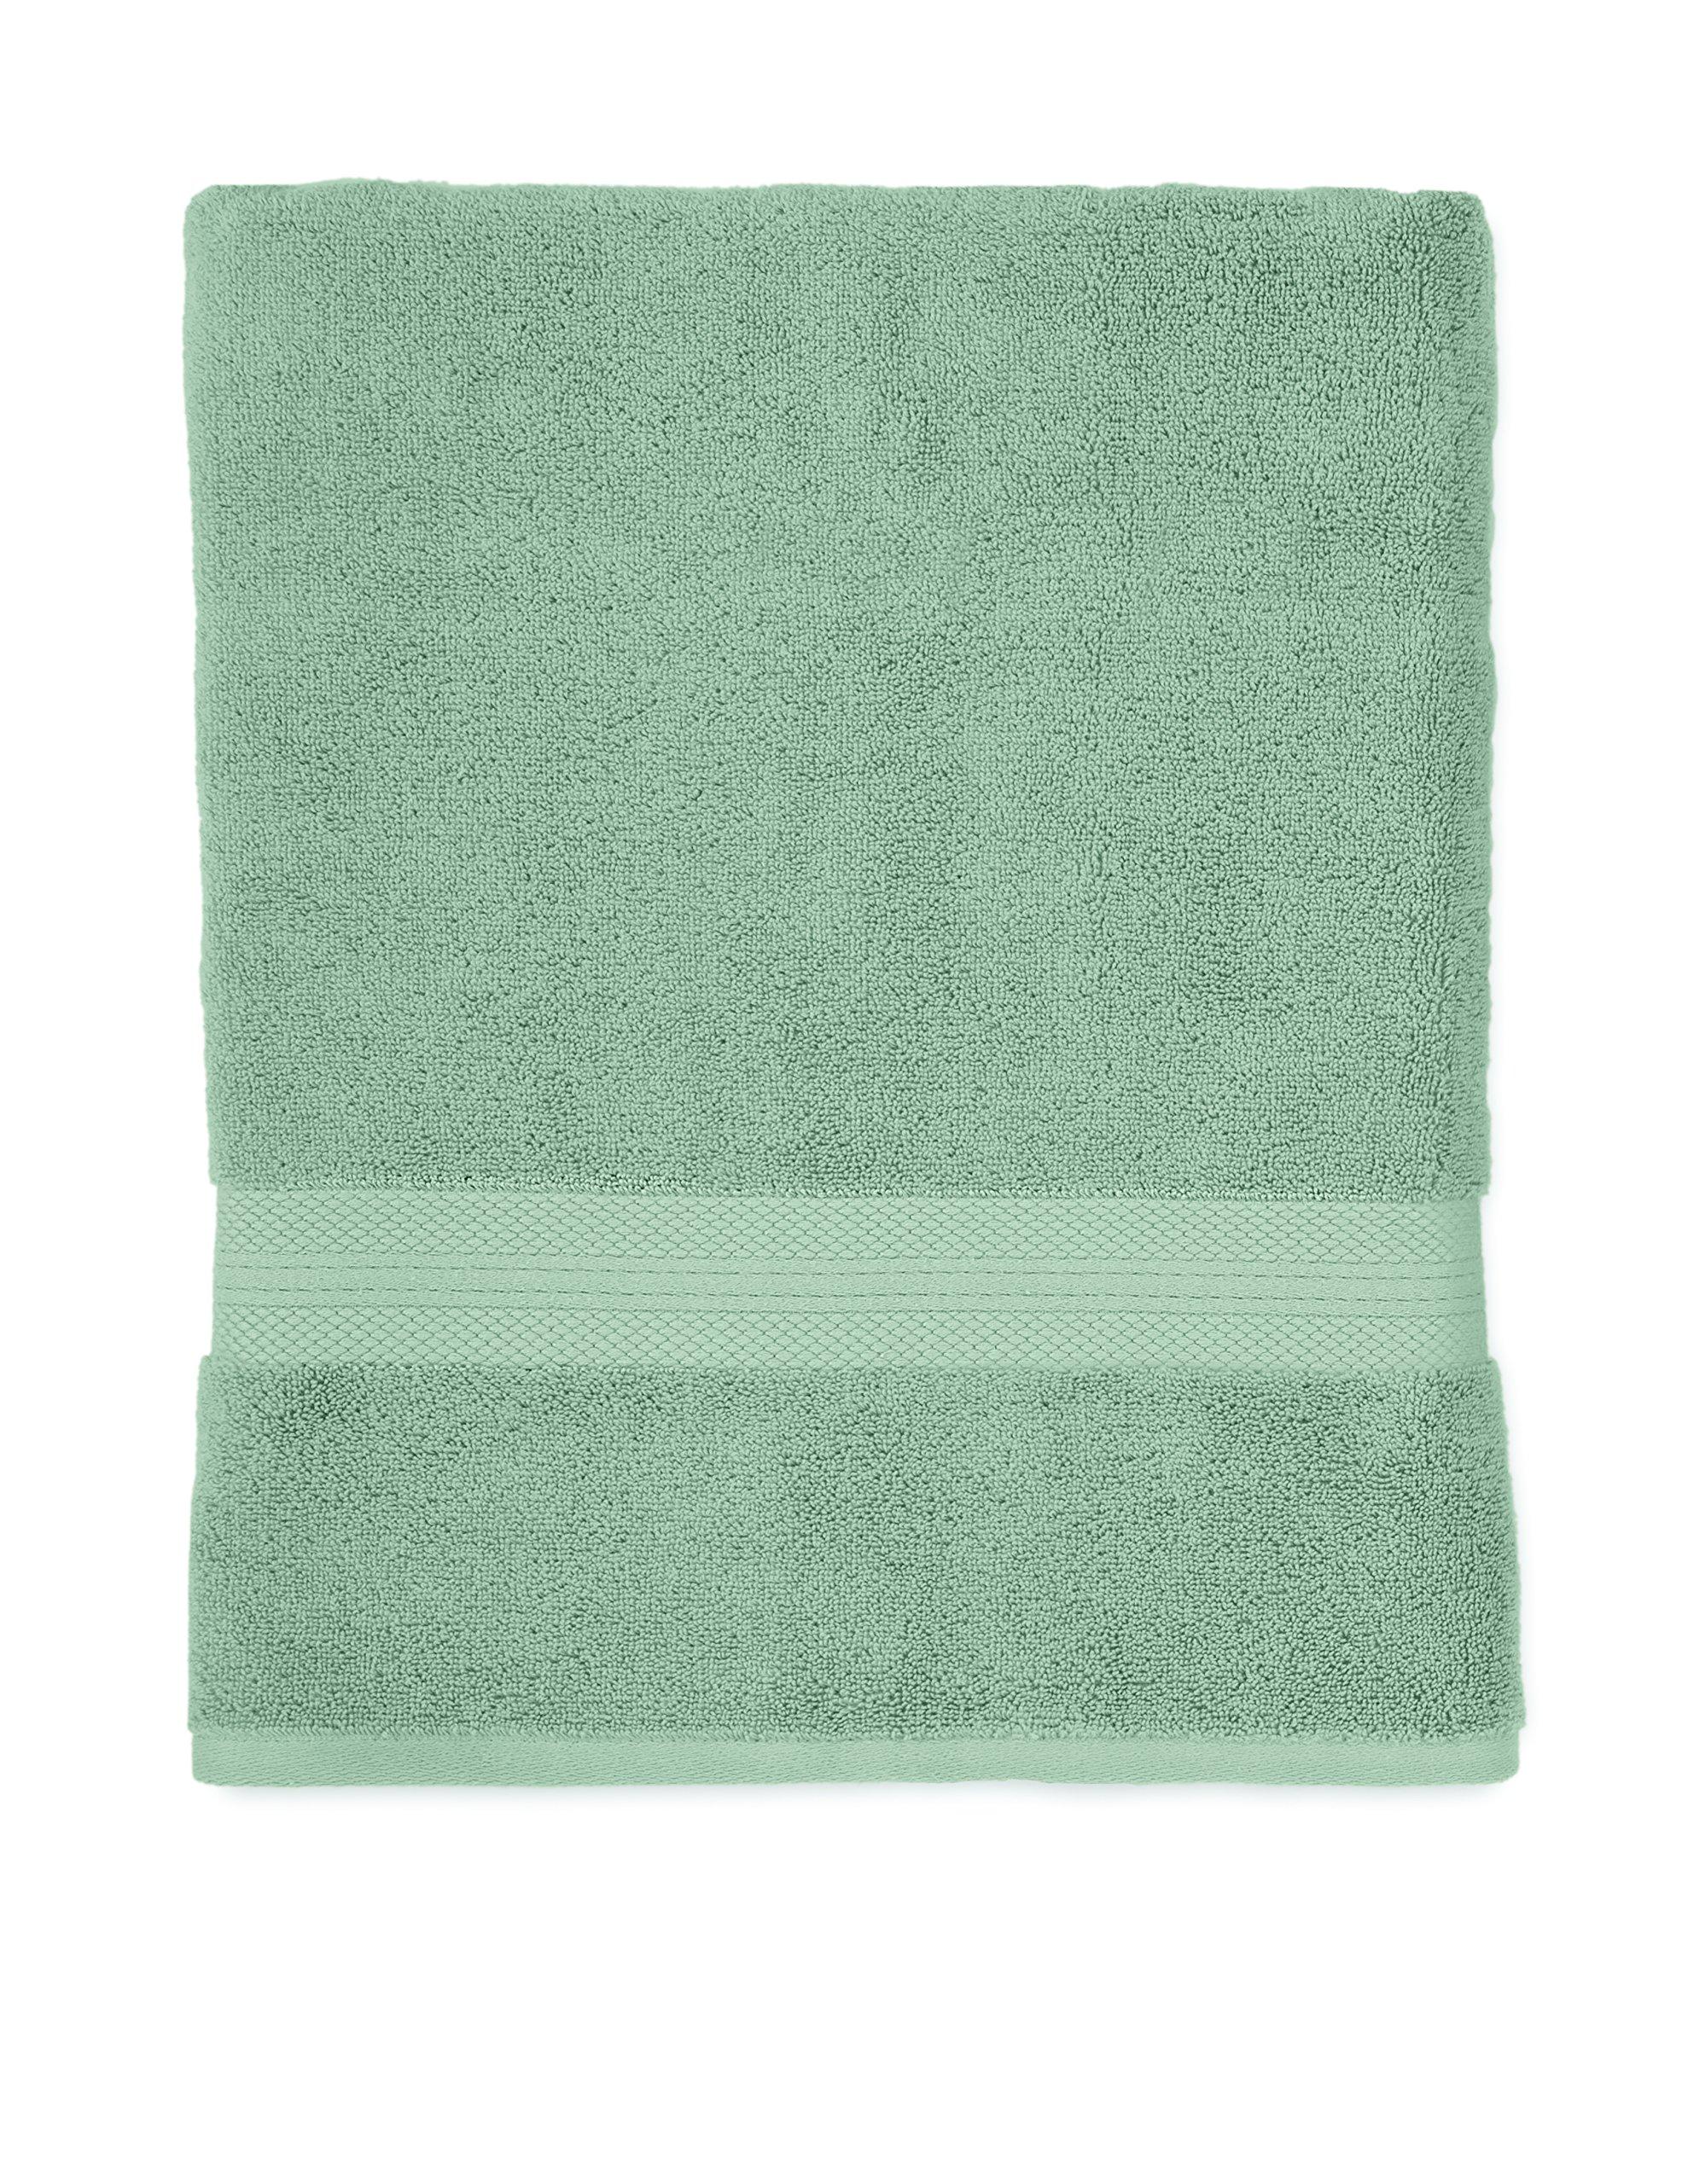 Martex Abundance Bath Towel, Deluxe Quality, Home, Guest - Machine Washable, Soft, Absorbent, Superior - Silver Sage